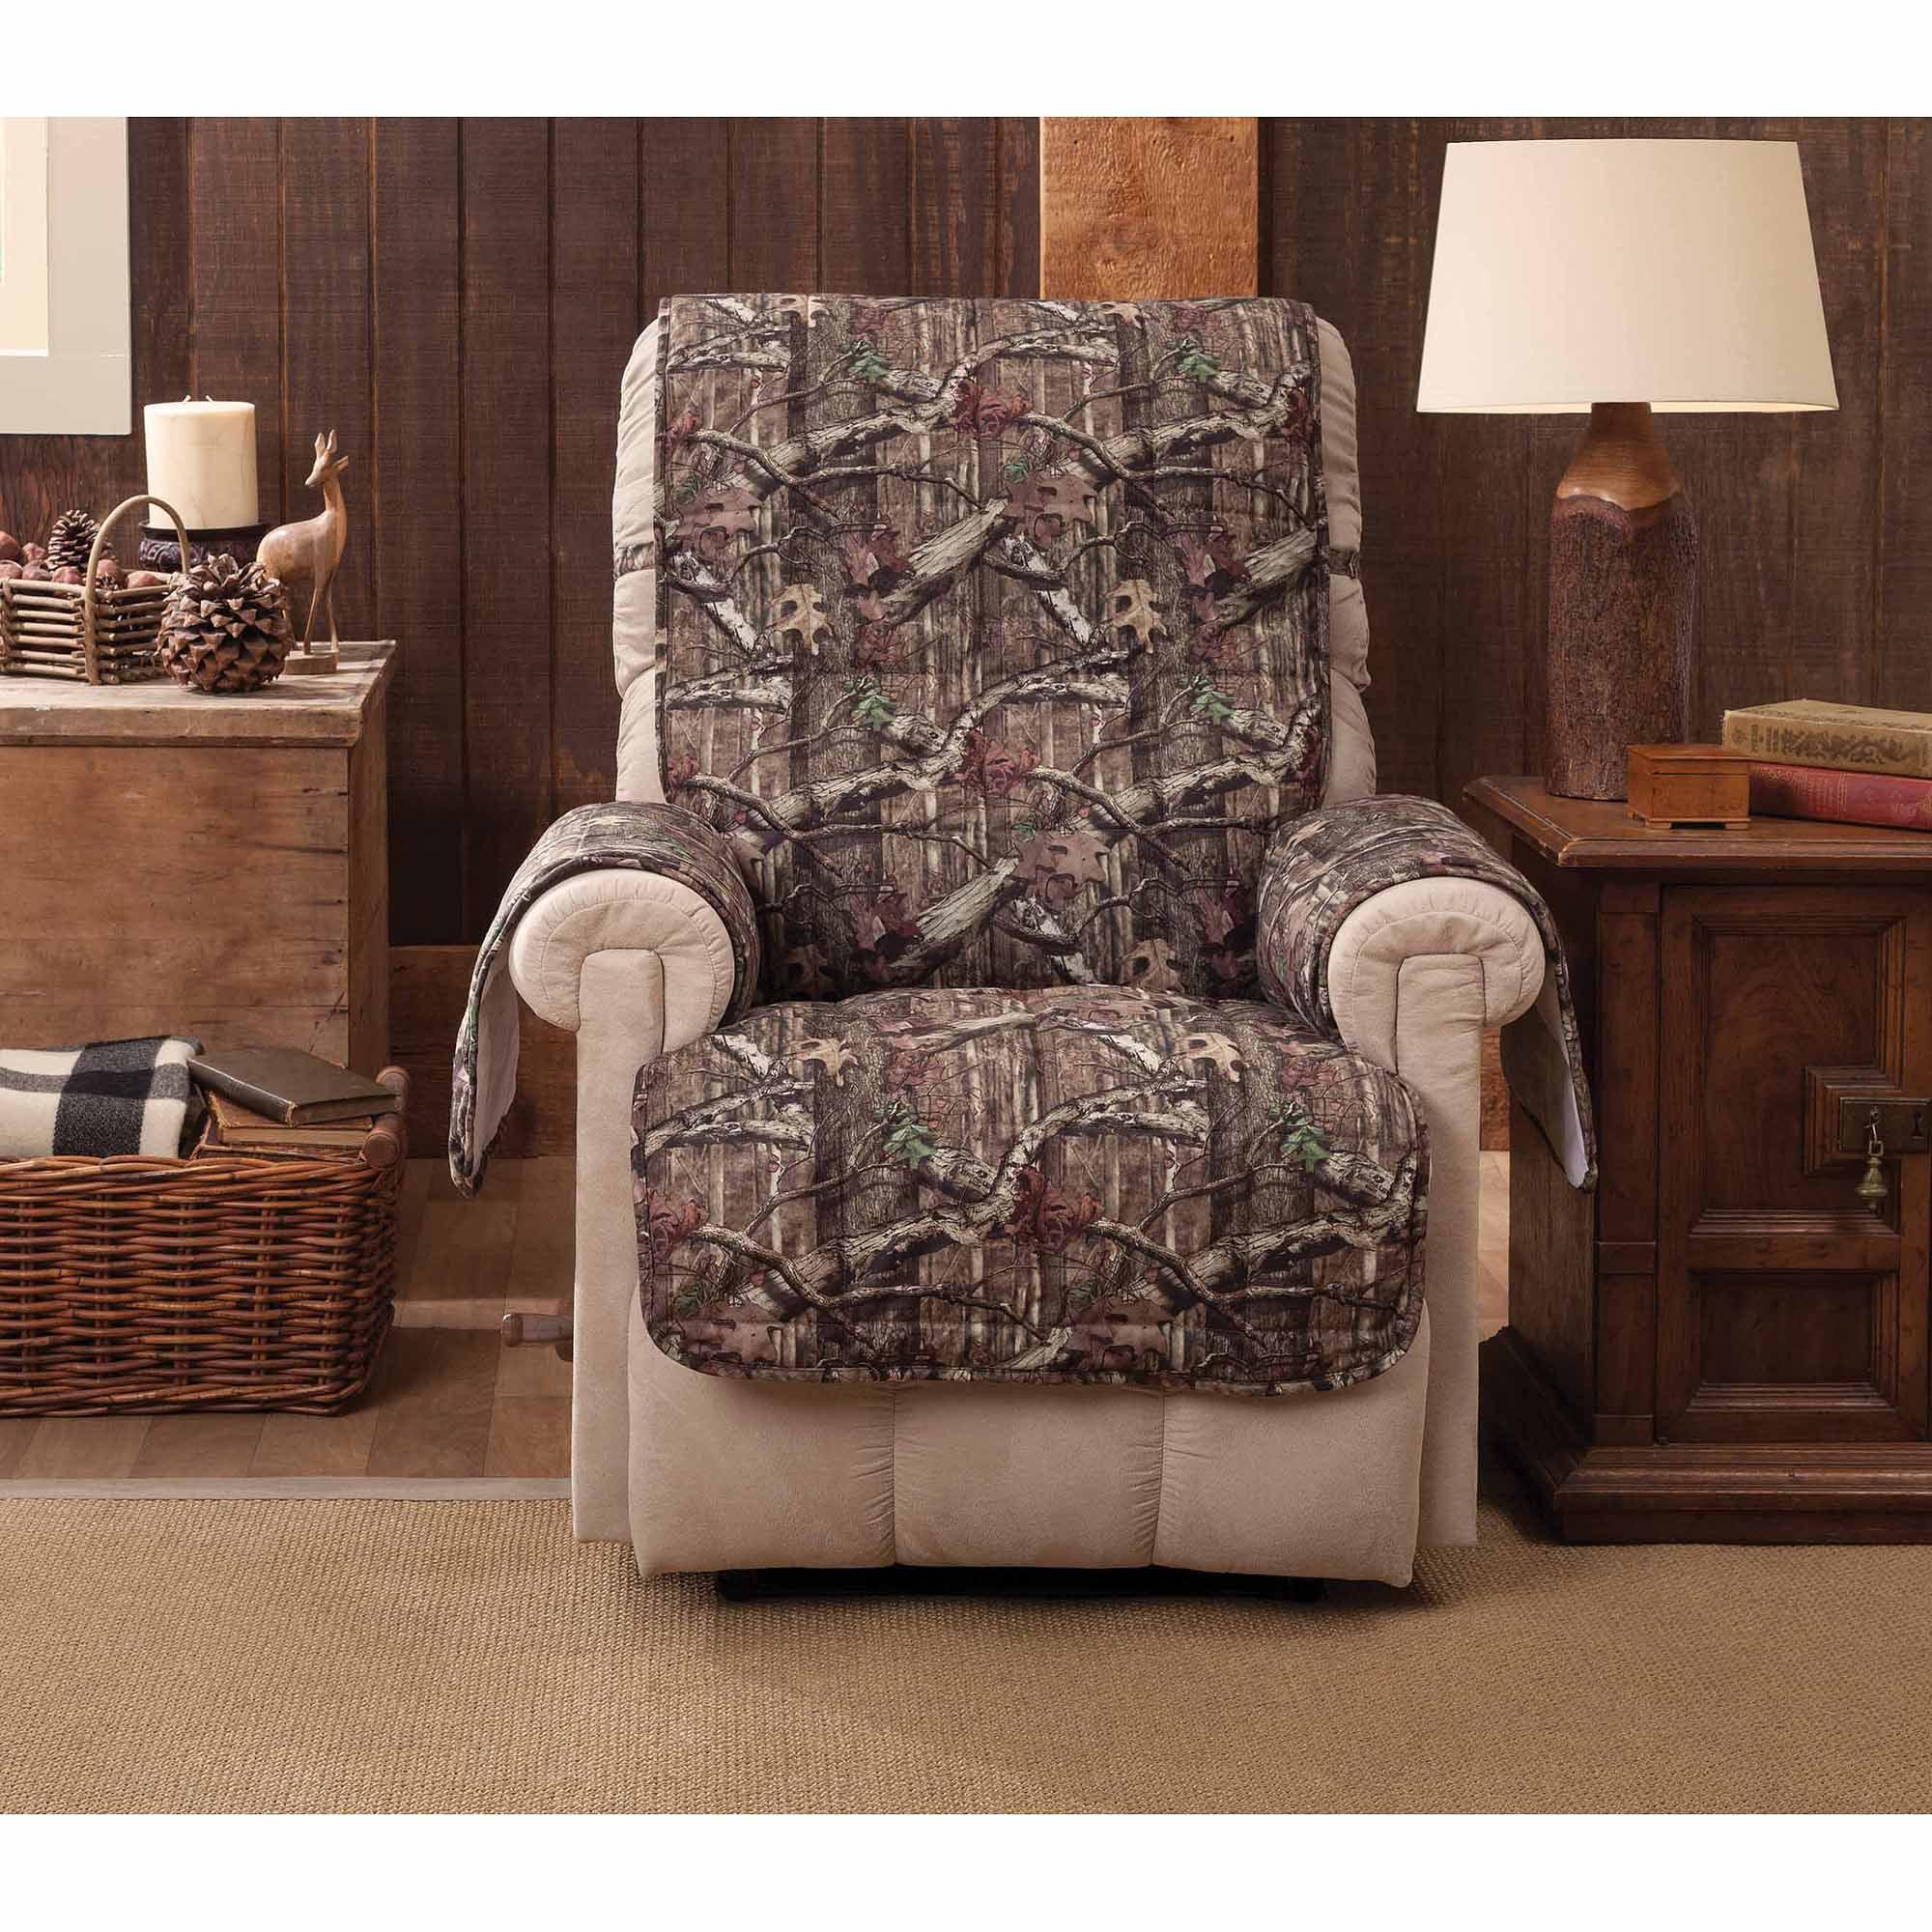 Mossy Oak BreakUp Infinity ReclinerWing Chair Protector